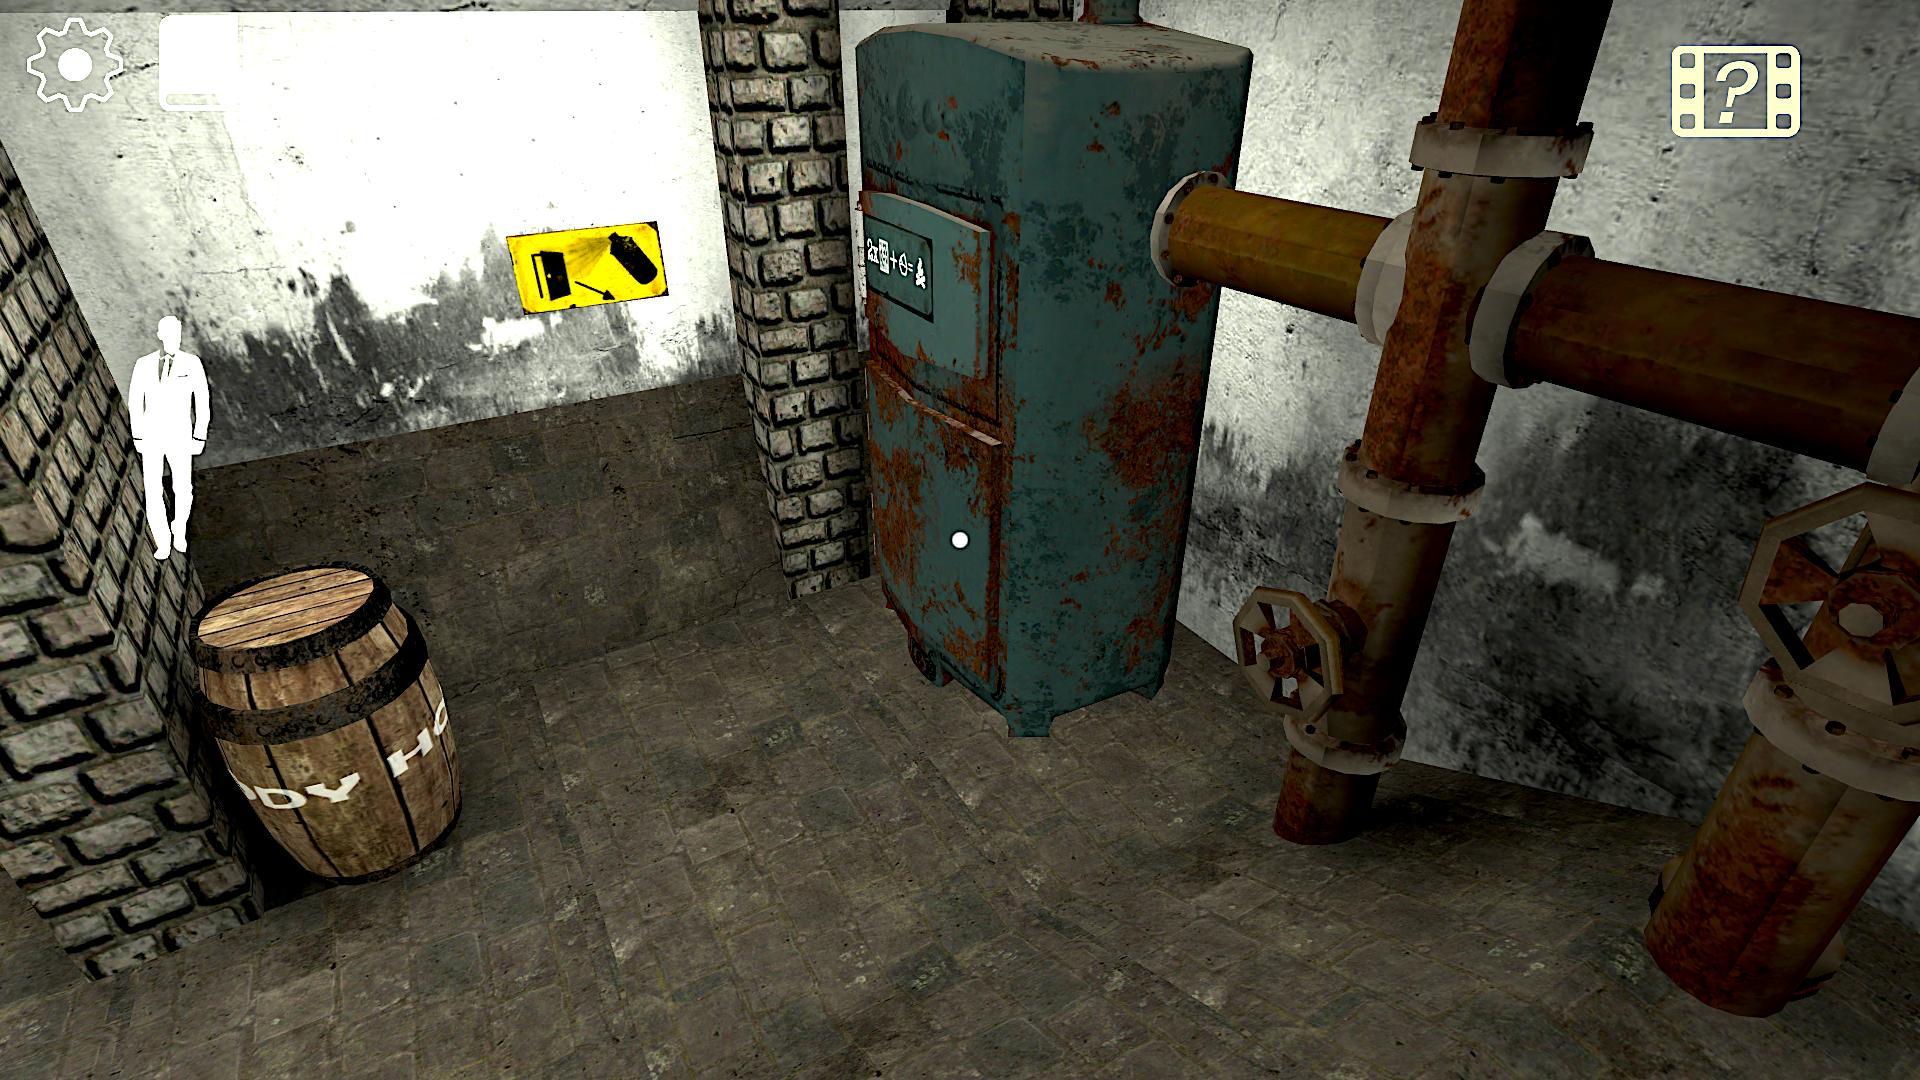 Evil Erich Sann : The New Horror Games. 2.5.0 Screenshot 5